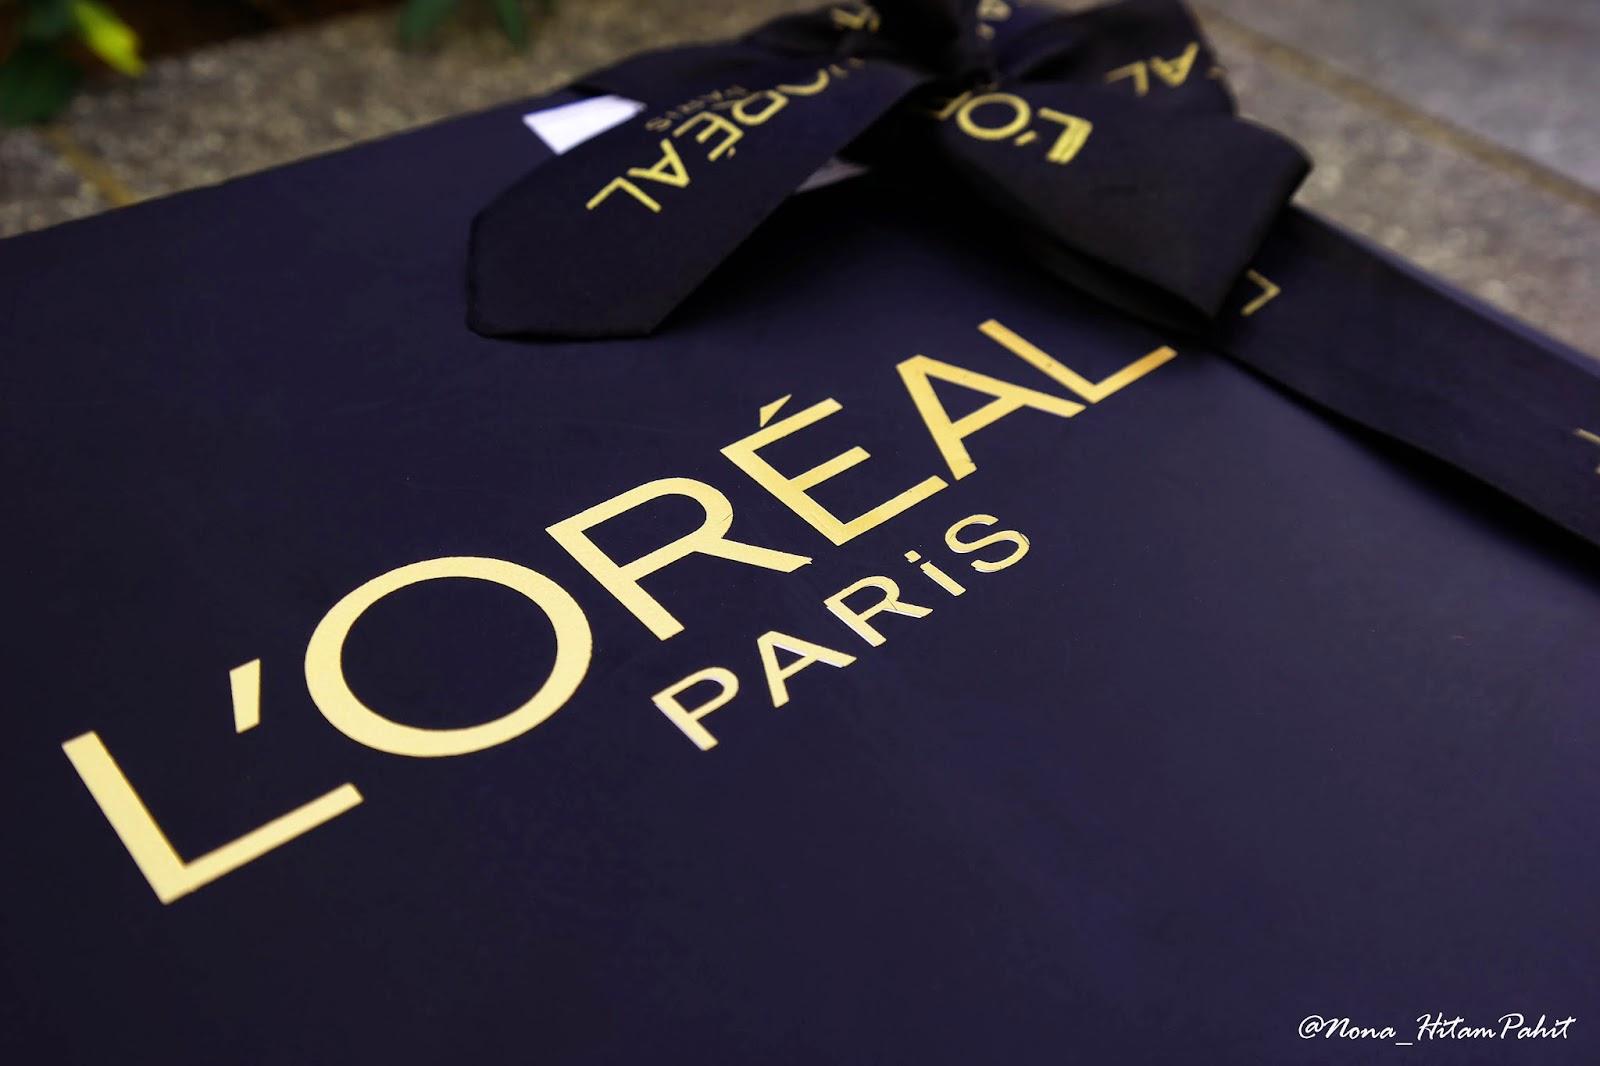 L'Oreal Paris Indonesia Beauty box